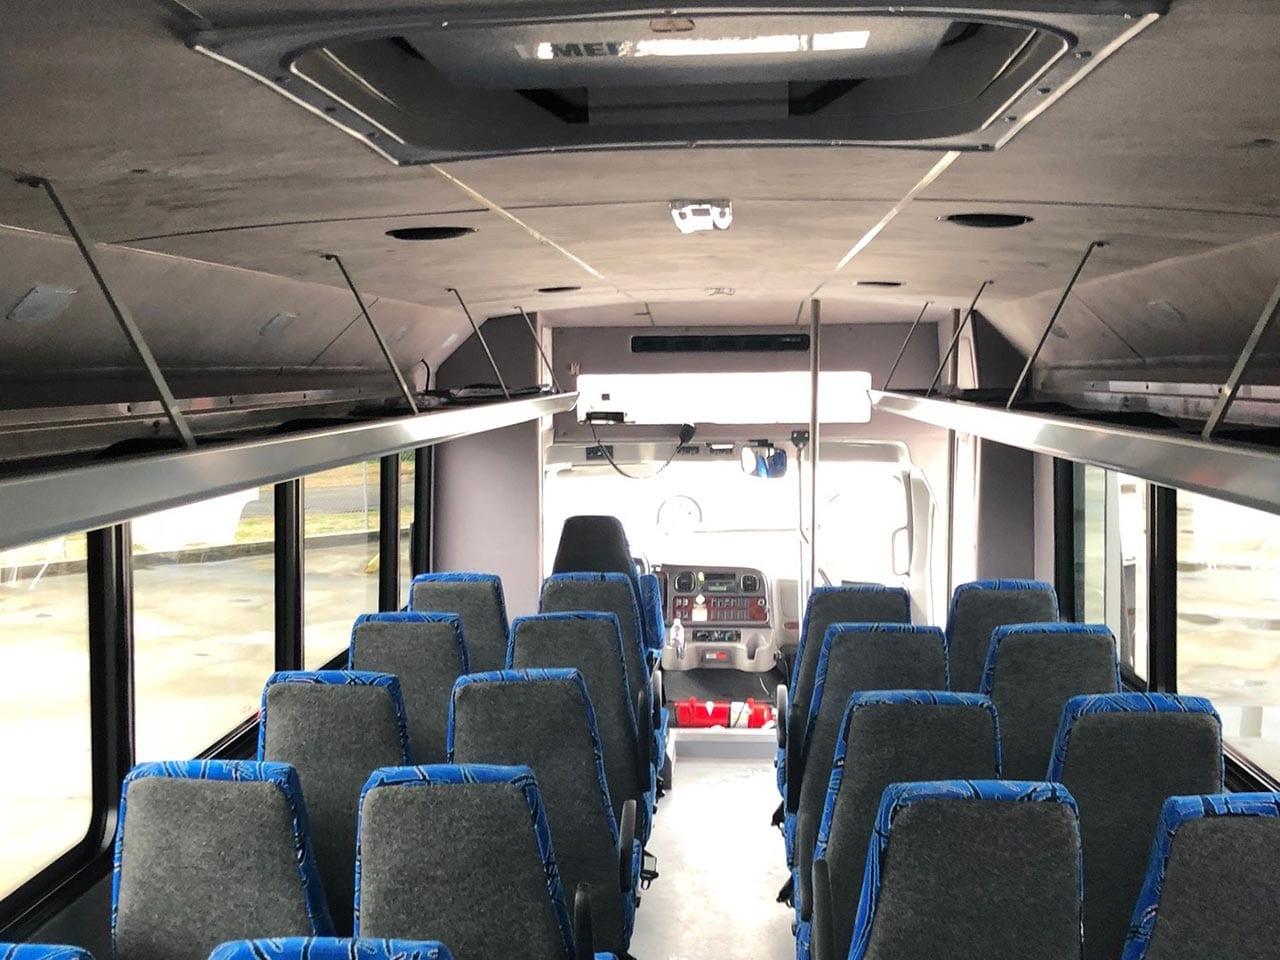 33 Passenger Minibus Seating